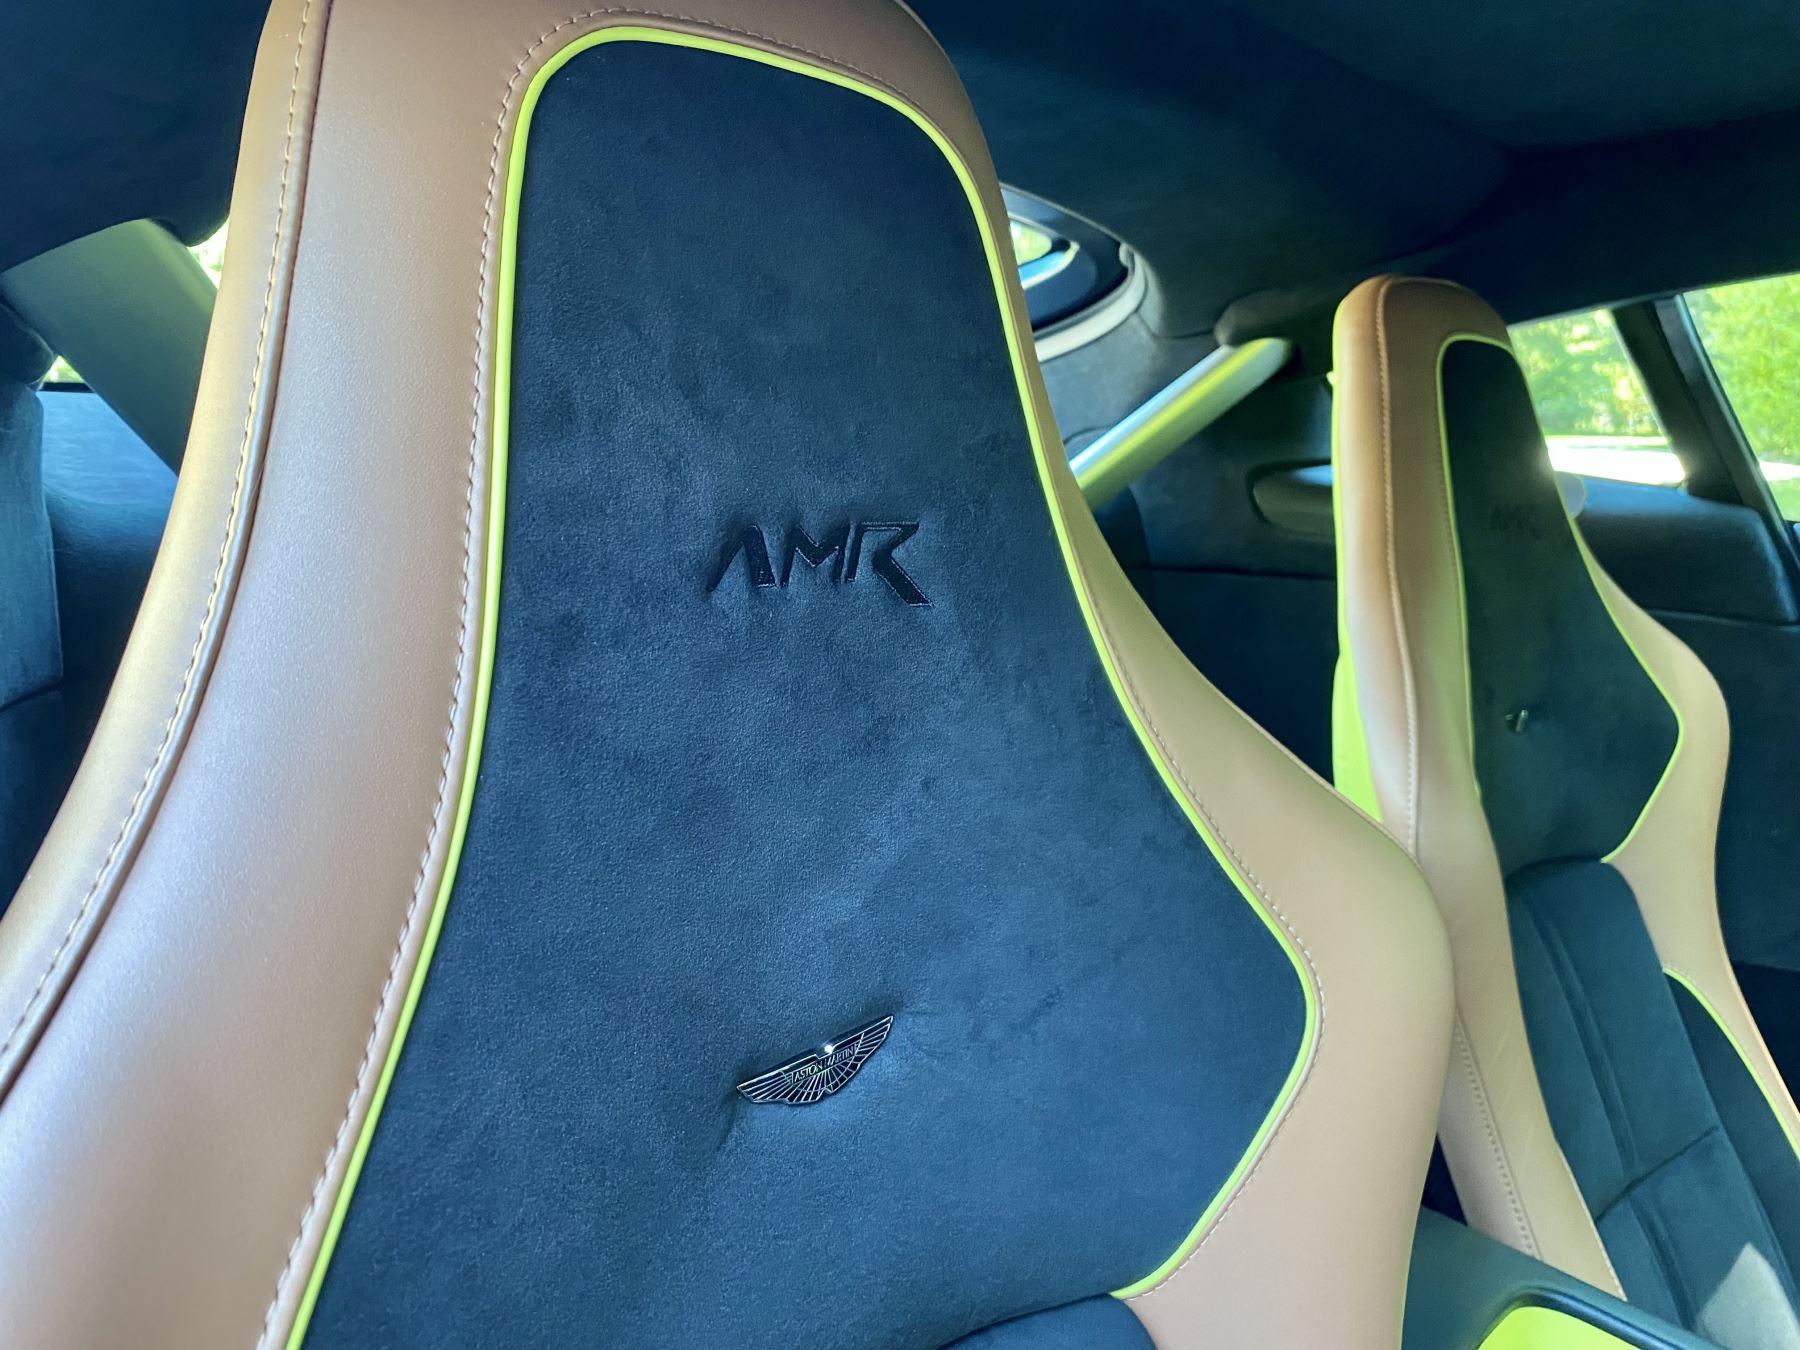 Aston Martin V12 Vantage AMR 6.0 V12 600BHP Manual 1 of 100.     1 Owner From New, Full Aston Martin History. image 23